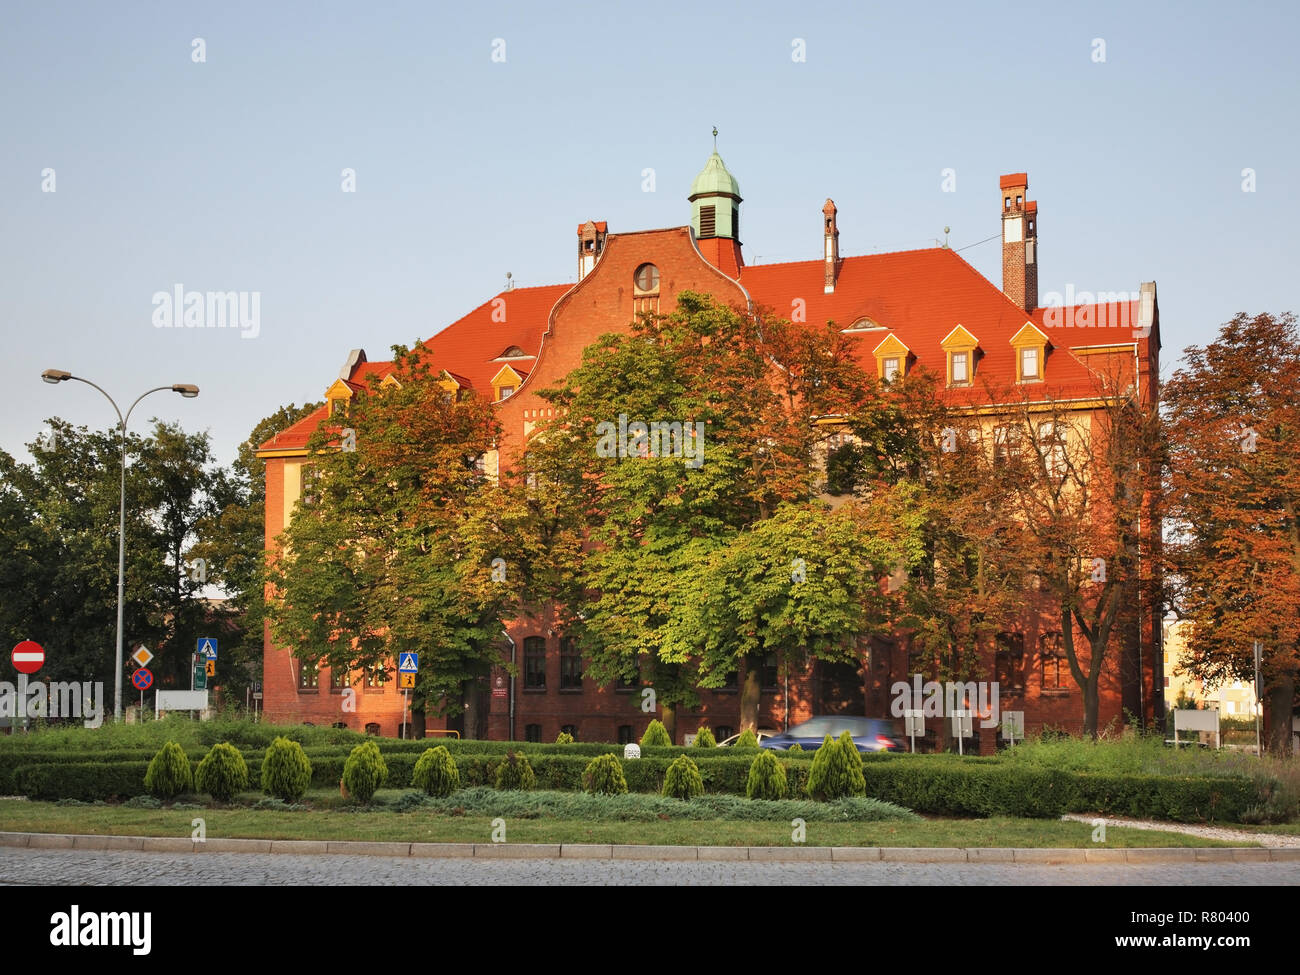 Junior high school No. 1 in Inowroclaw. Poland - Stock Image